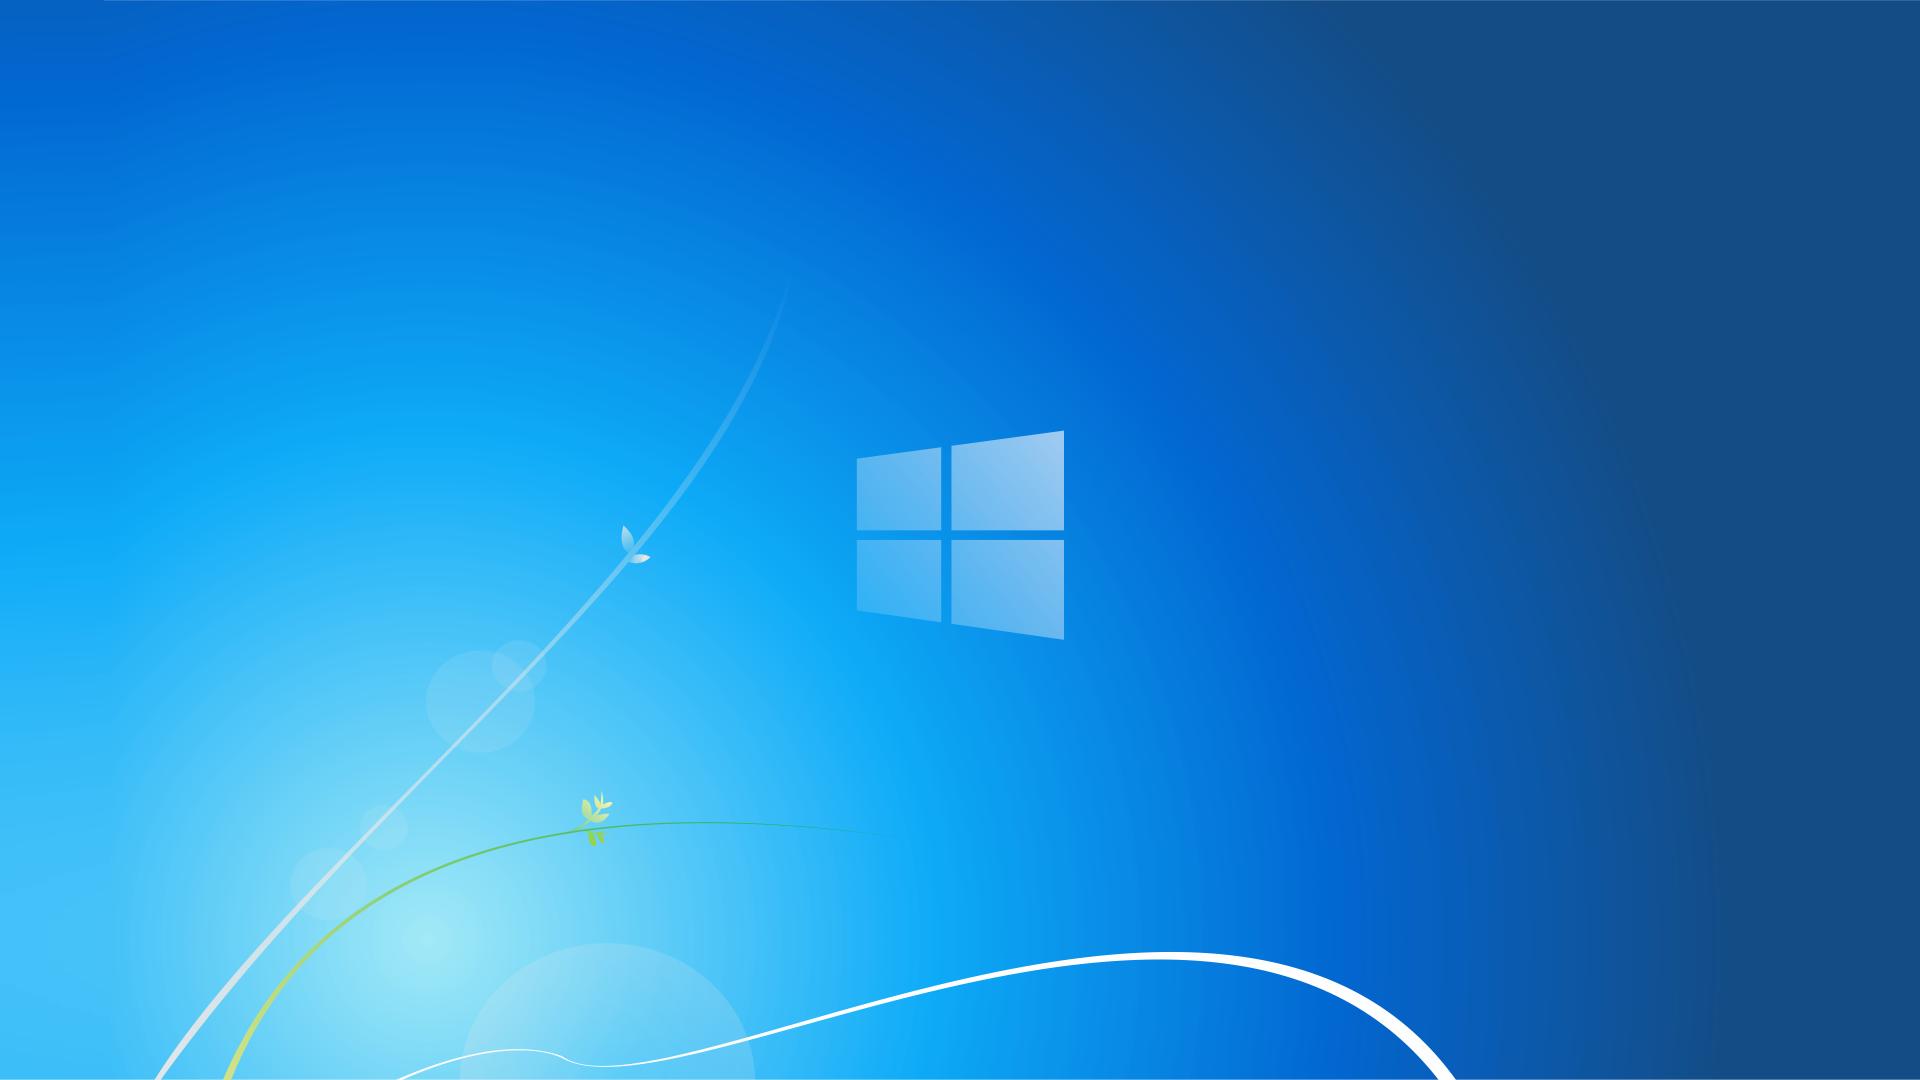 Windows 7 Wallpaper 7.